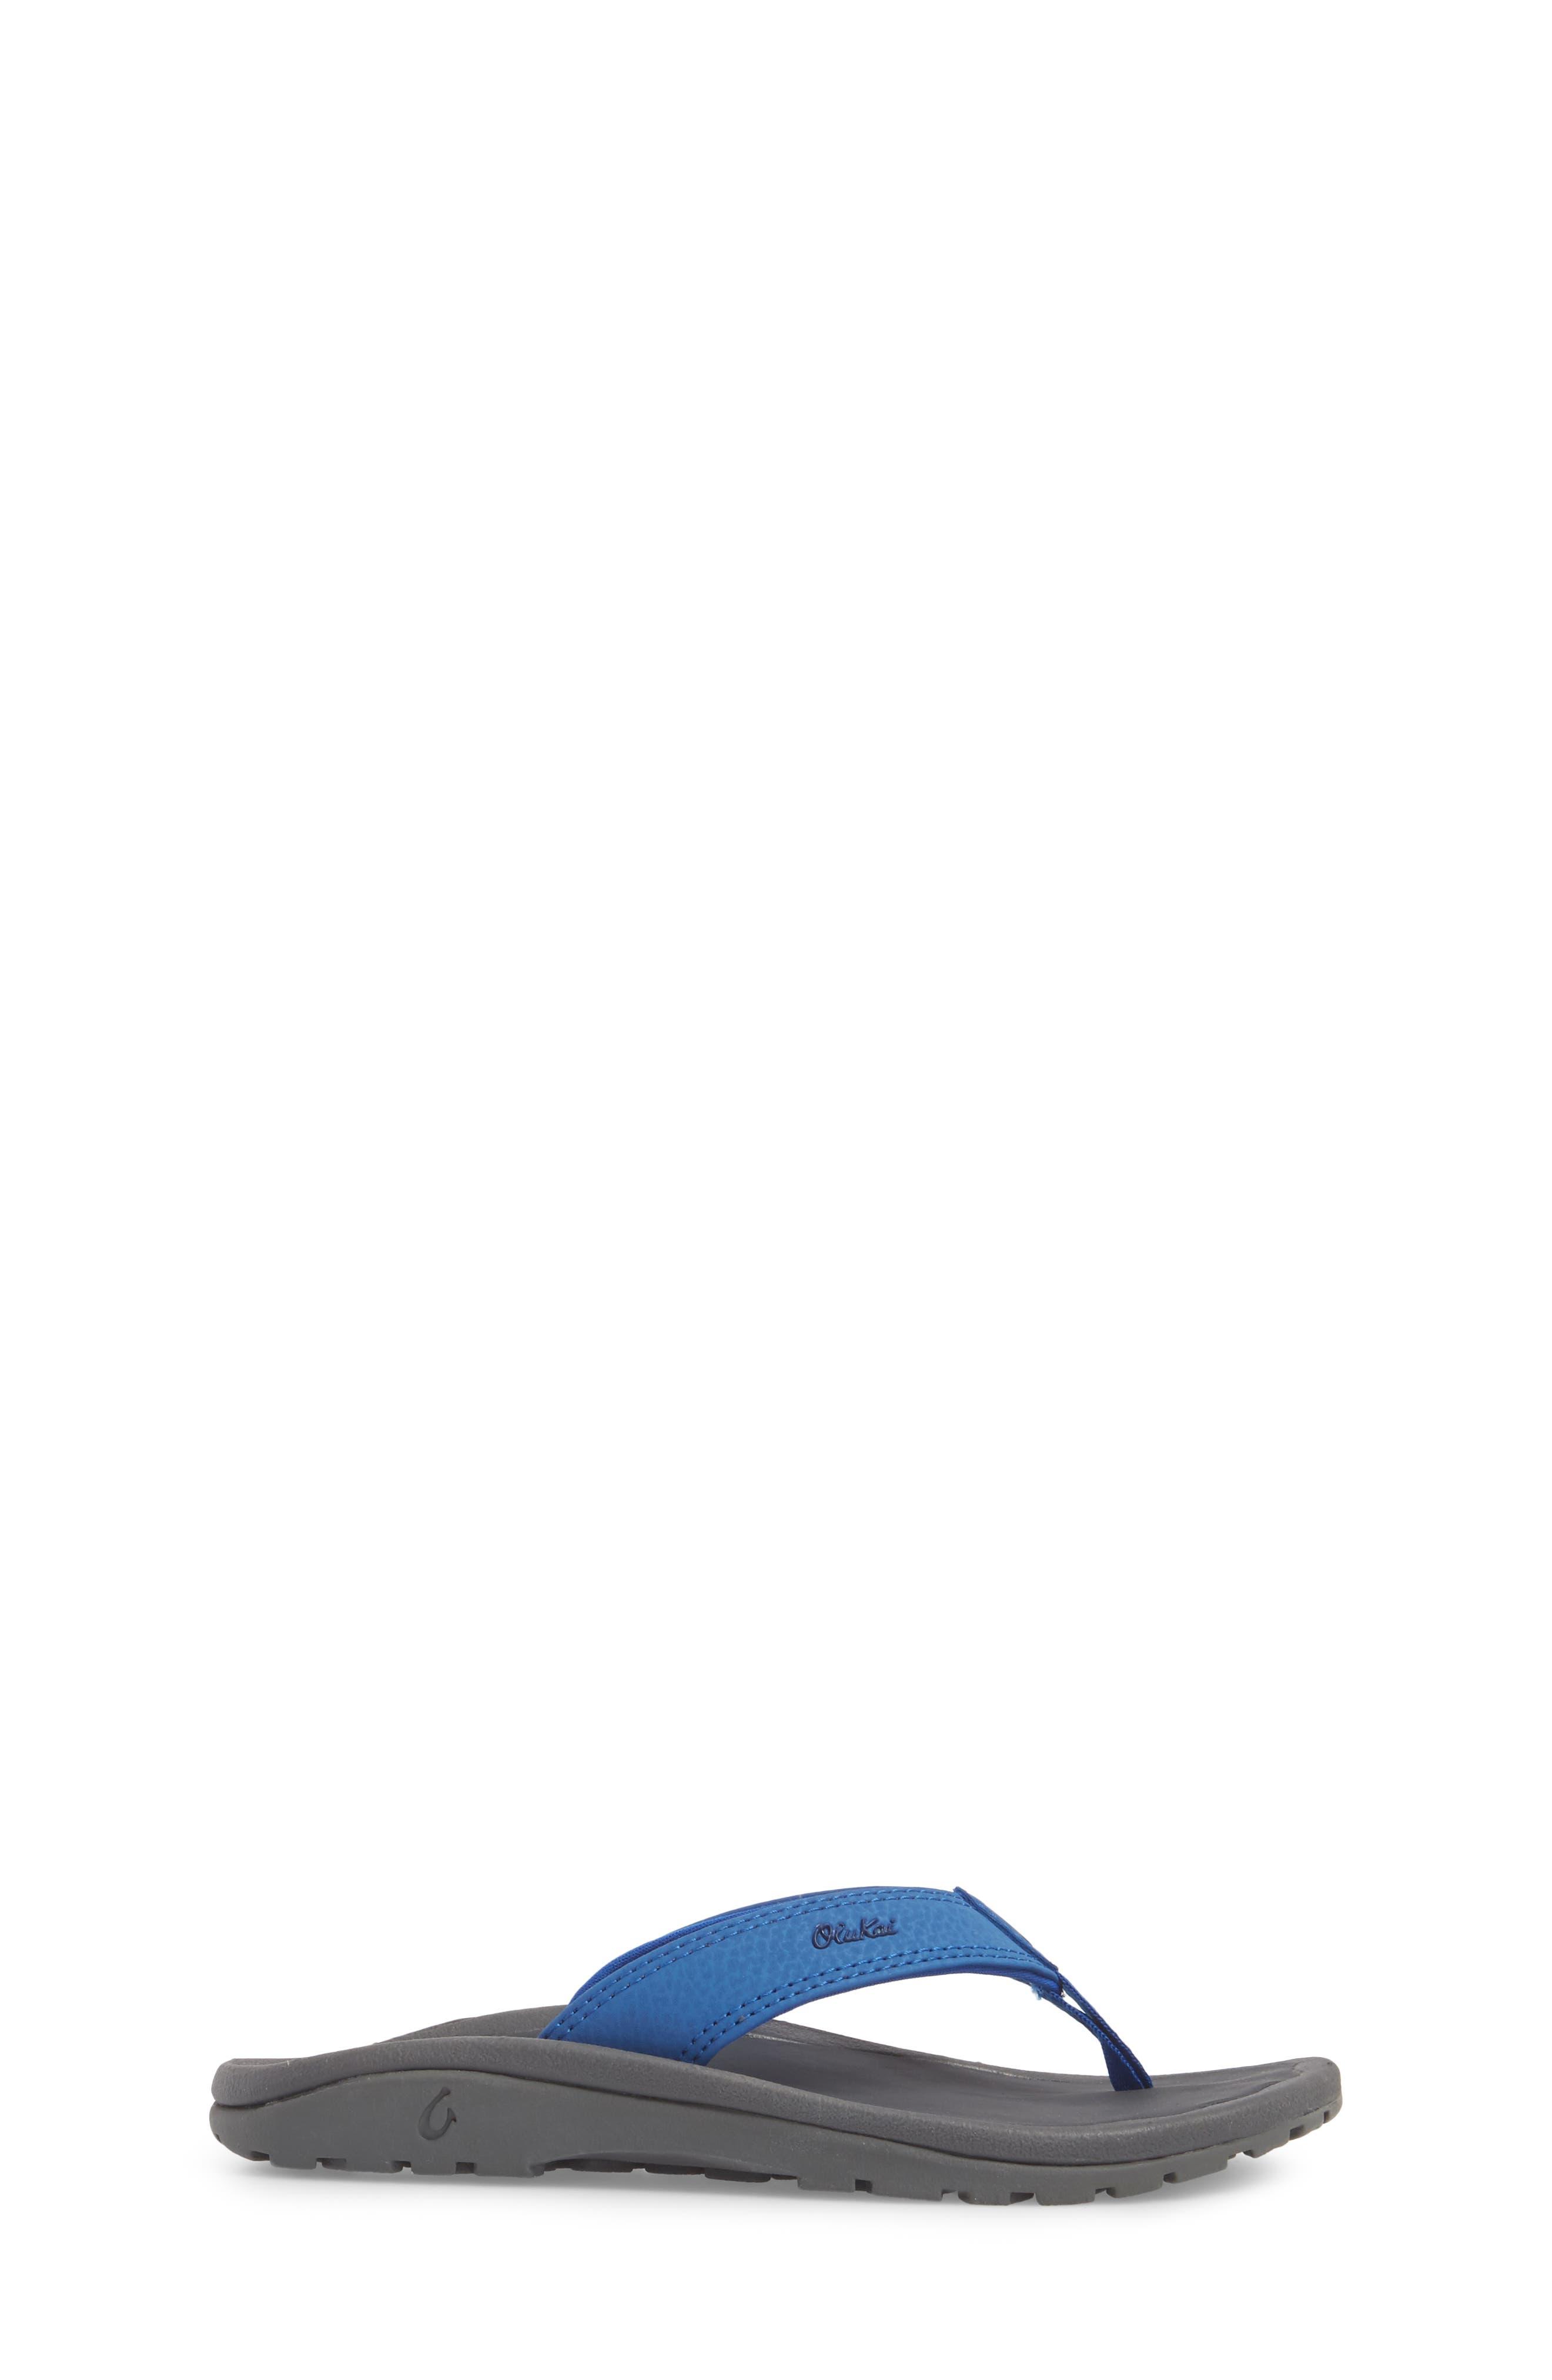 'Ohana' Sandal,                             Alternate thumbnail 3, color,                             AQUA BLUE/ DARK SHADOW